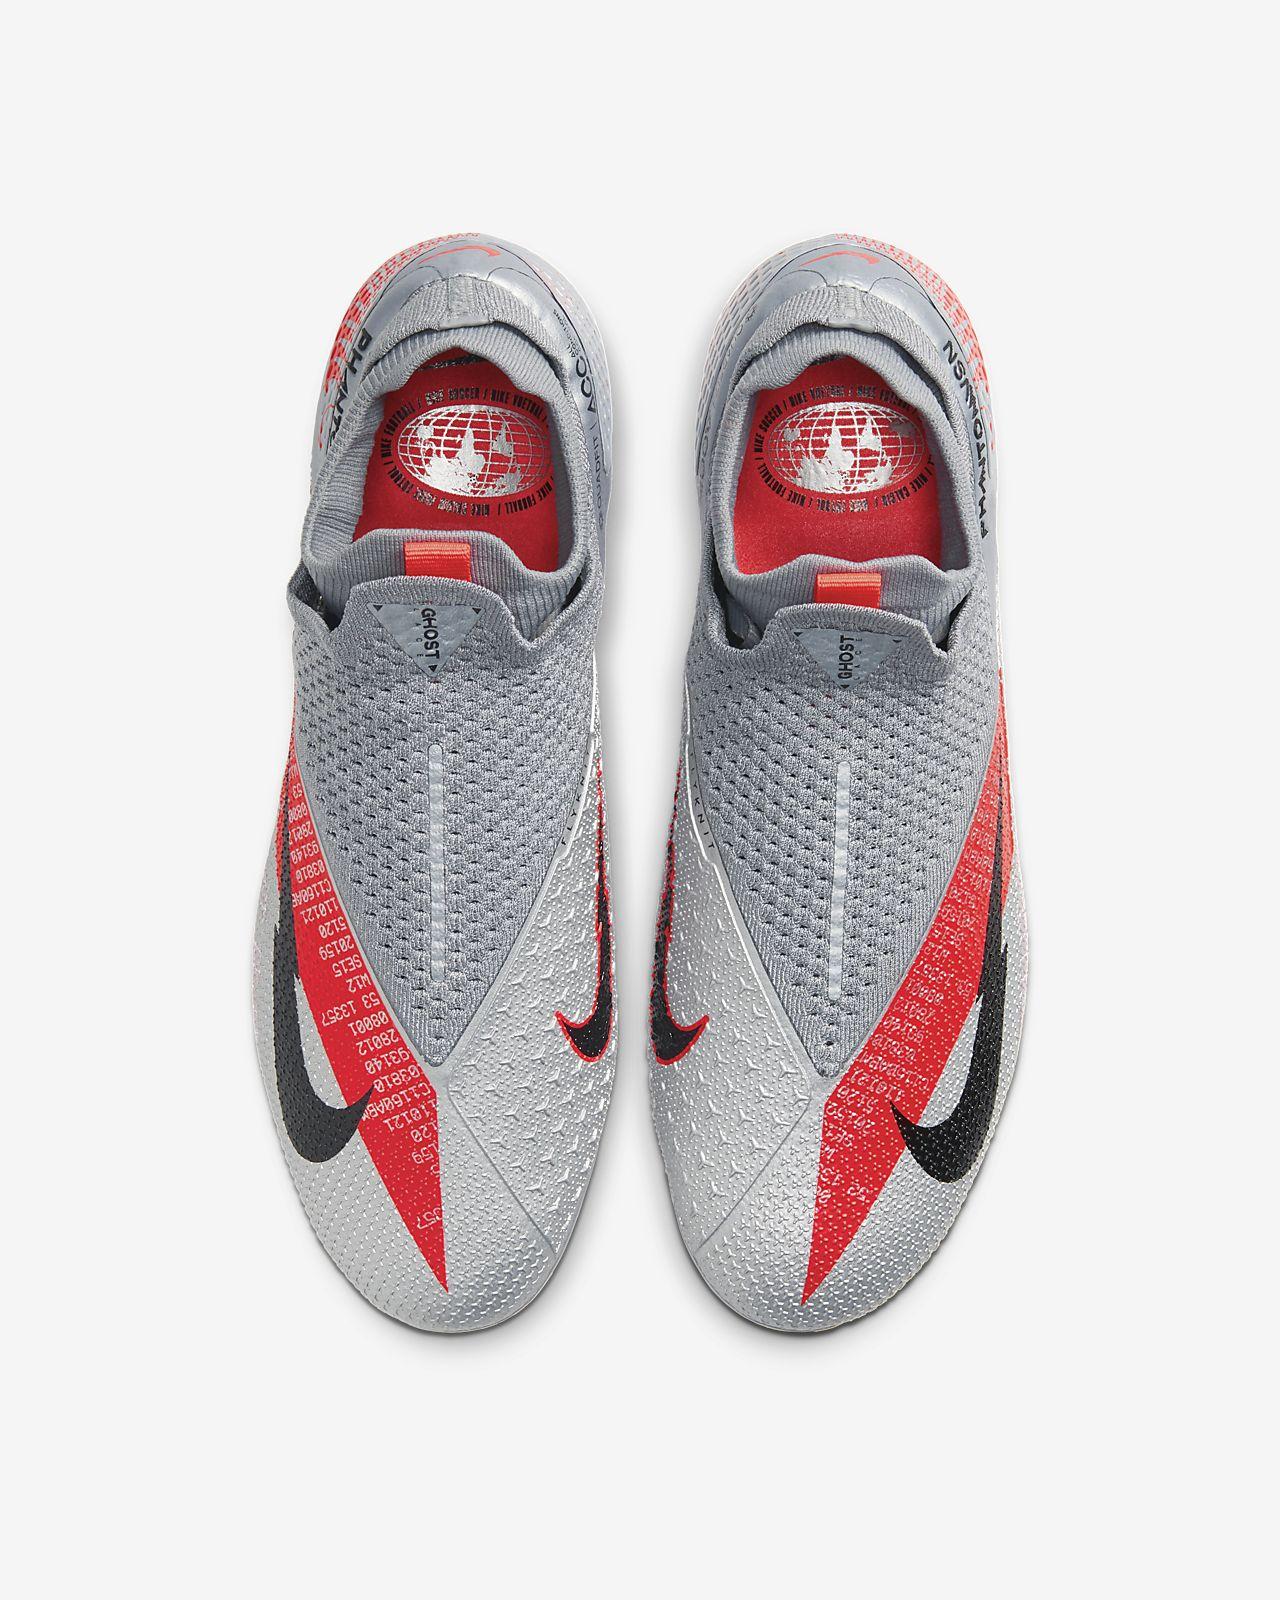 Chaussure de football à crampons pour terrain sec Nike Phantom Vision 2 Elite Dynamic Fit FG